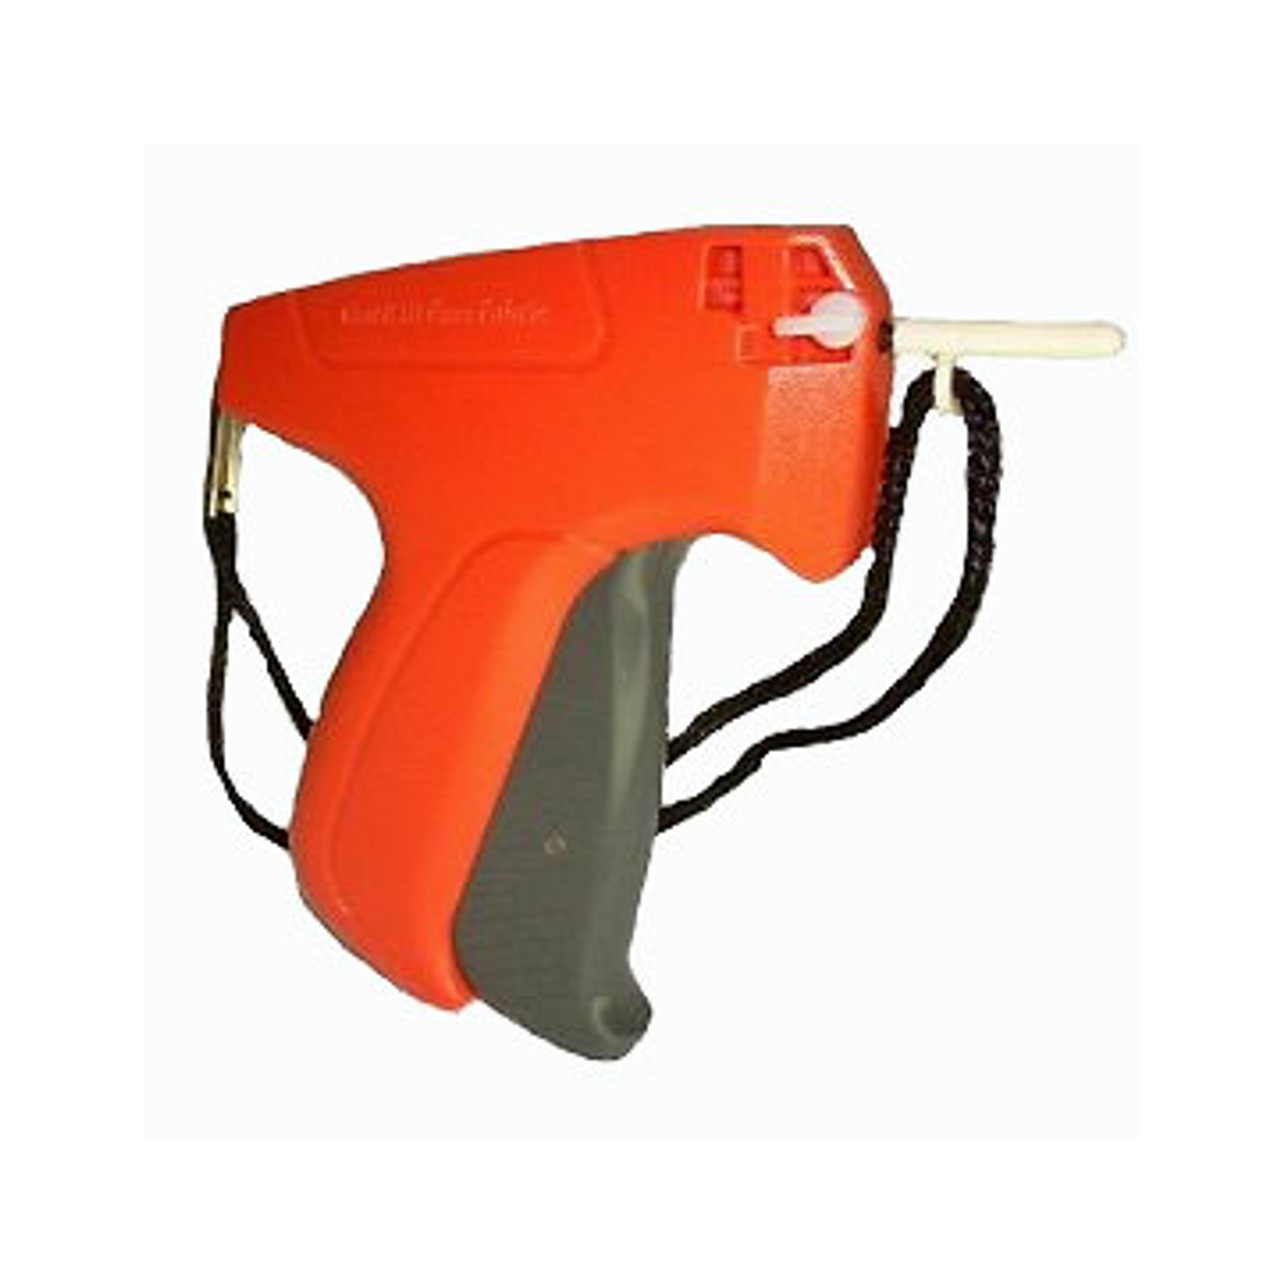 Reliable-Factory-Supply-Dennison-Mark-III-Switcher-Pistol-Grip-Fine